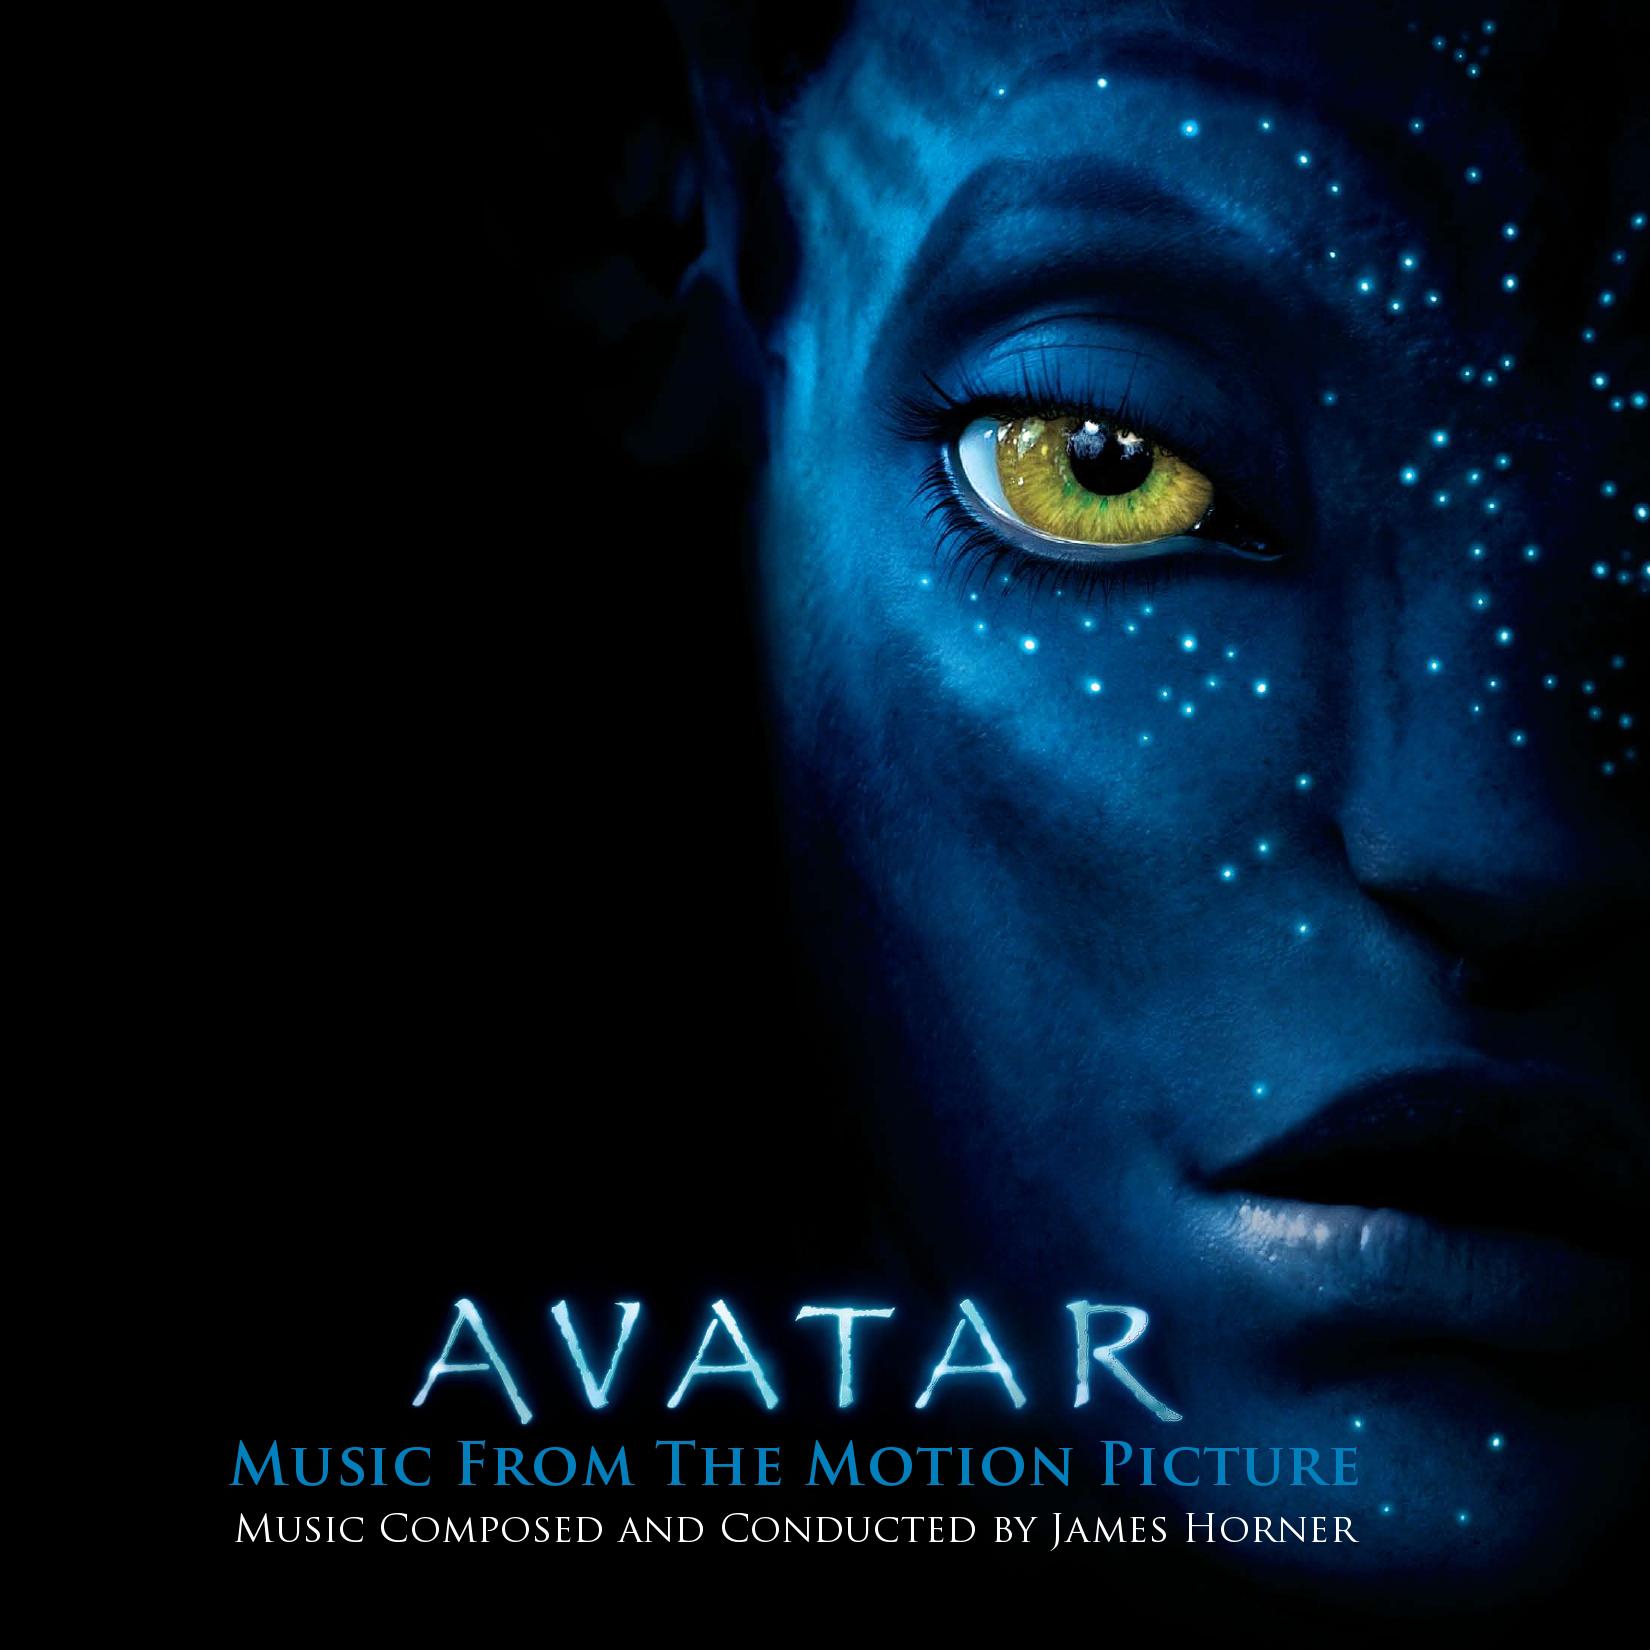 http://vignette1.wikia.nocookie.net/jamescameronsavatar/images/9/96/Avatar_Soundtrack.jpg/revision/20100516092818